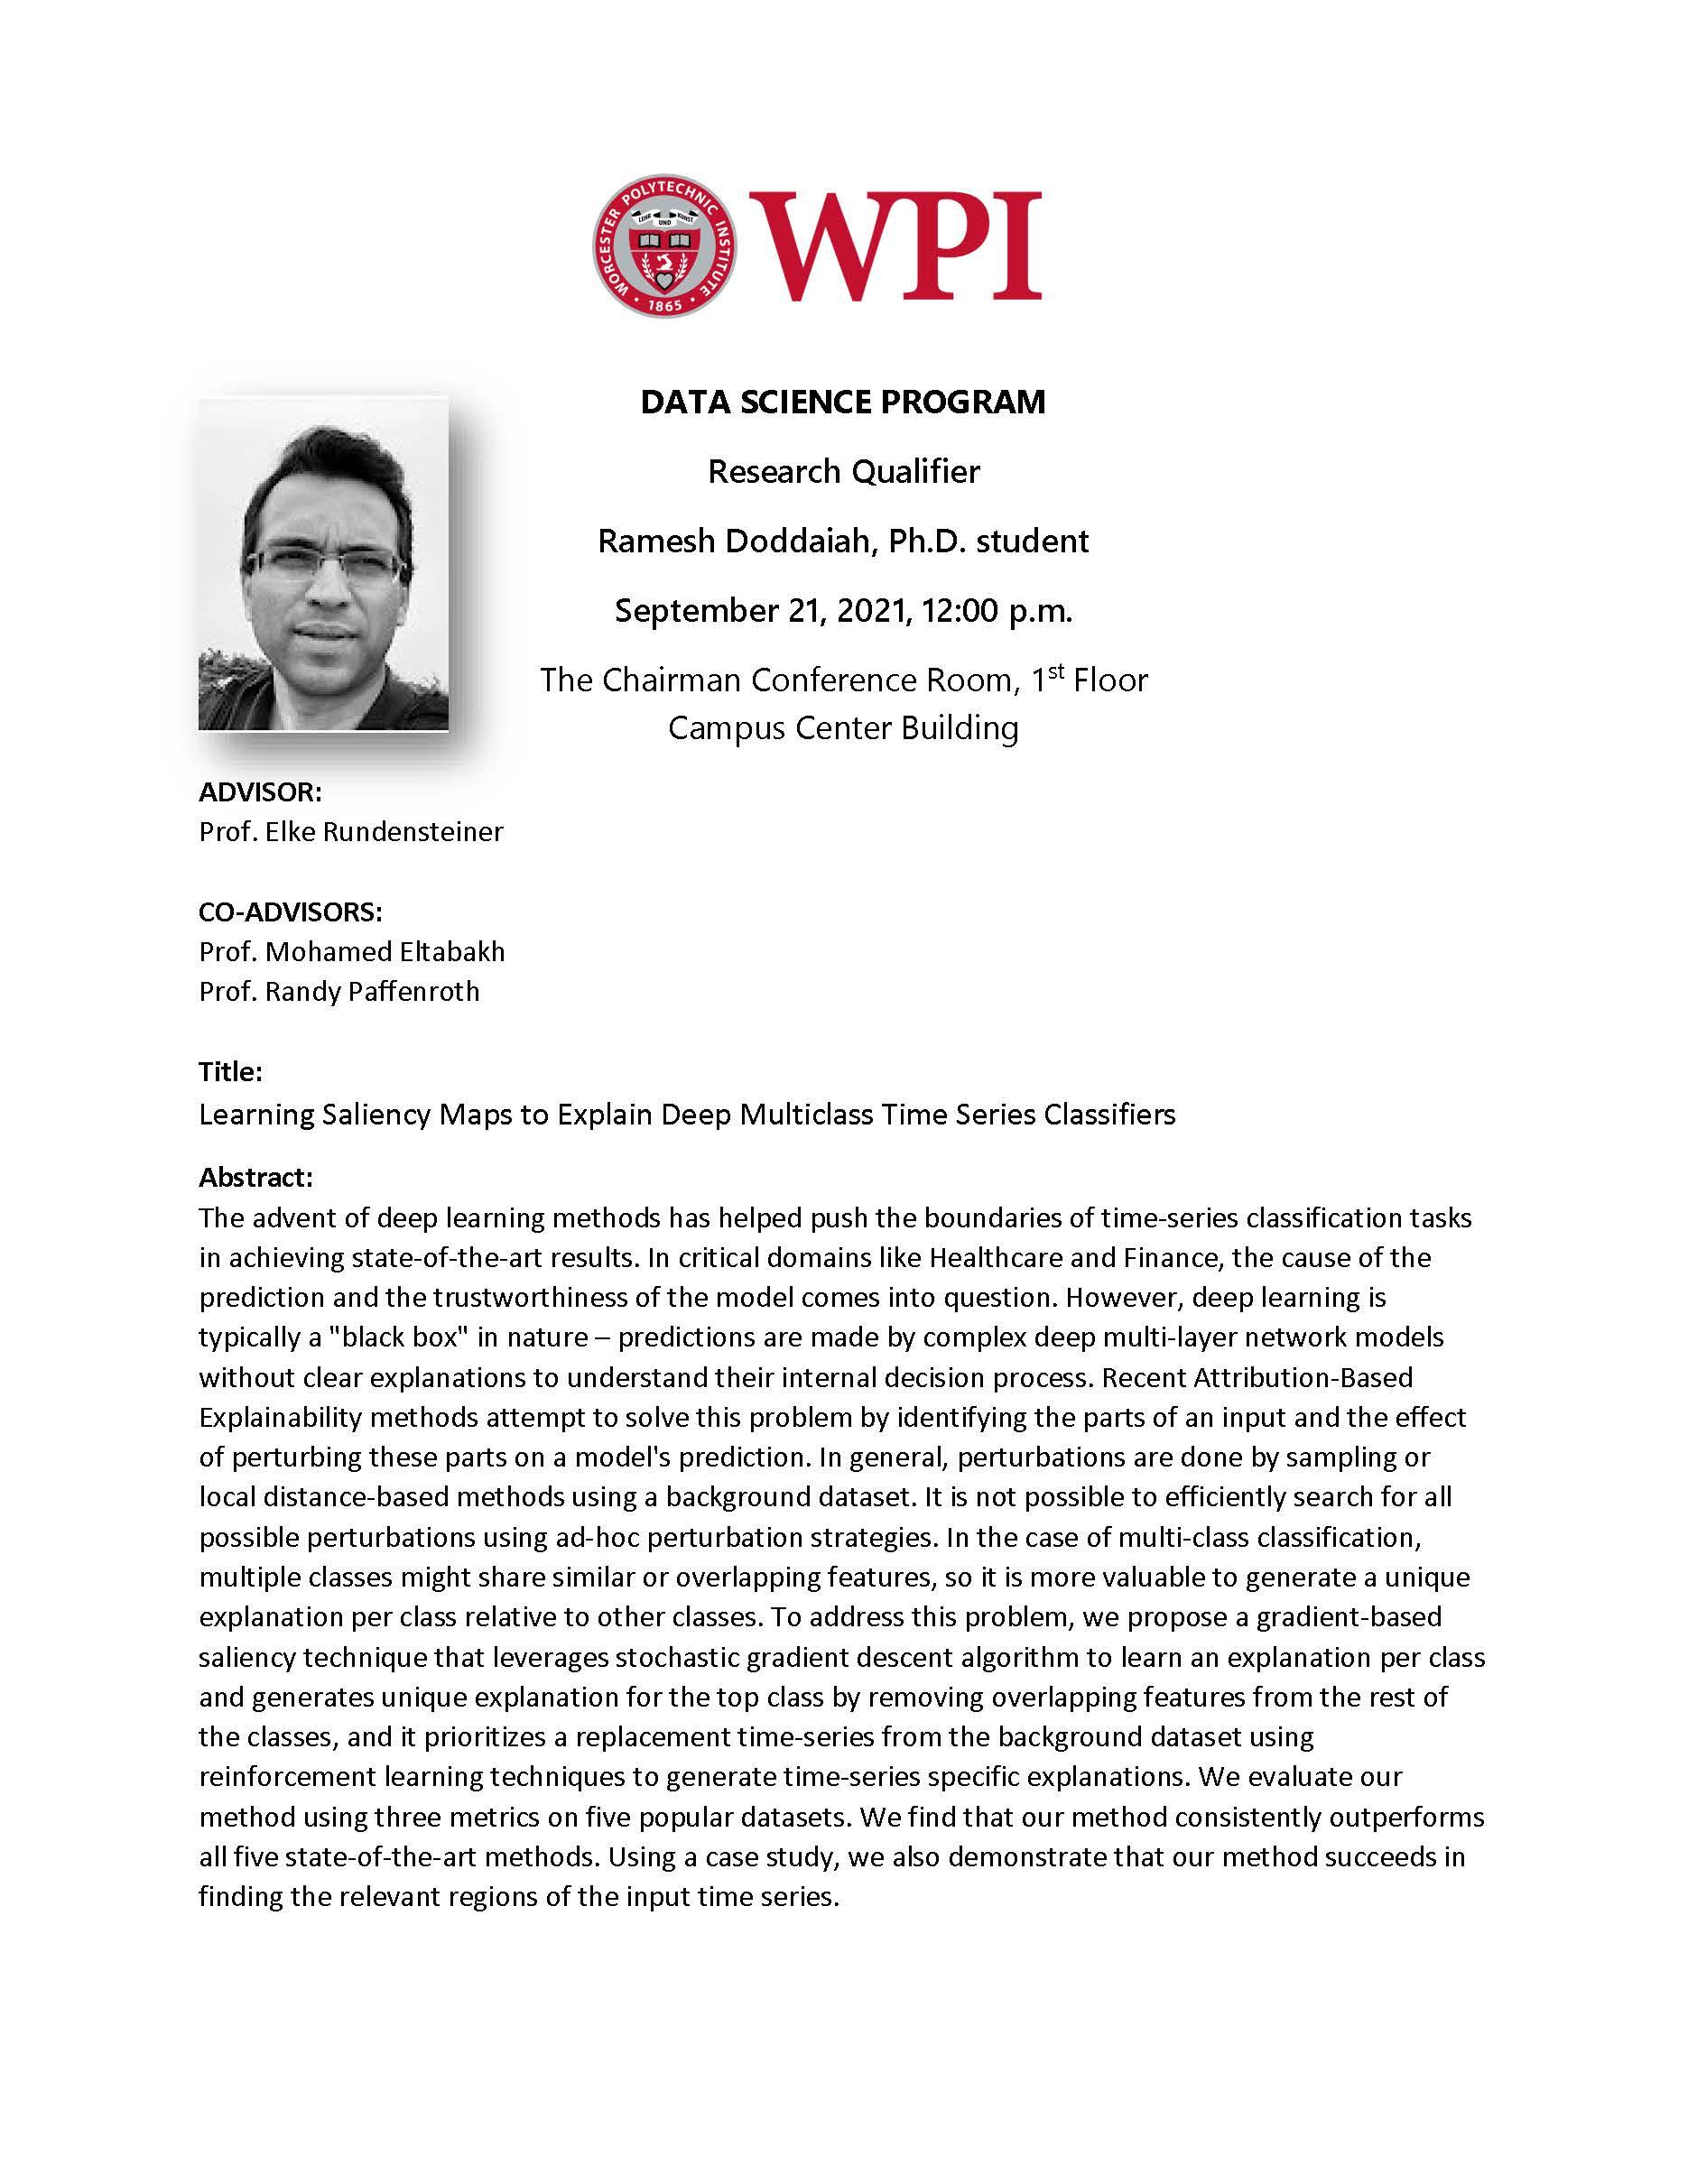 Ramesh Doddaiah - Research qualifier. alt